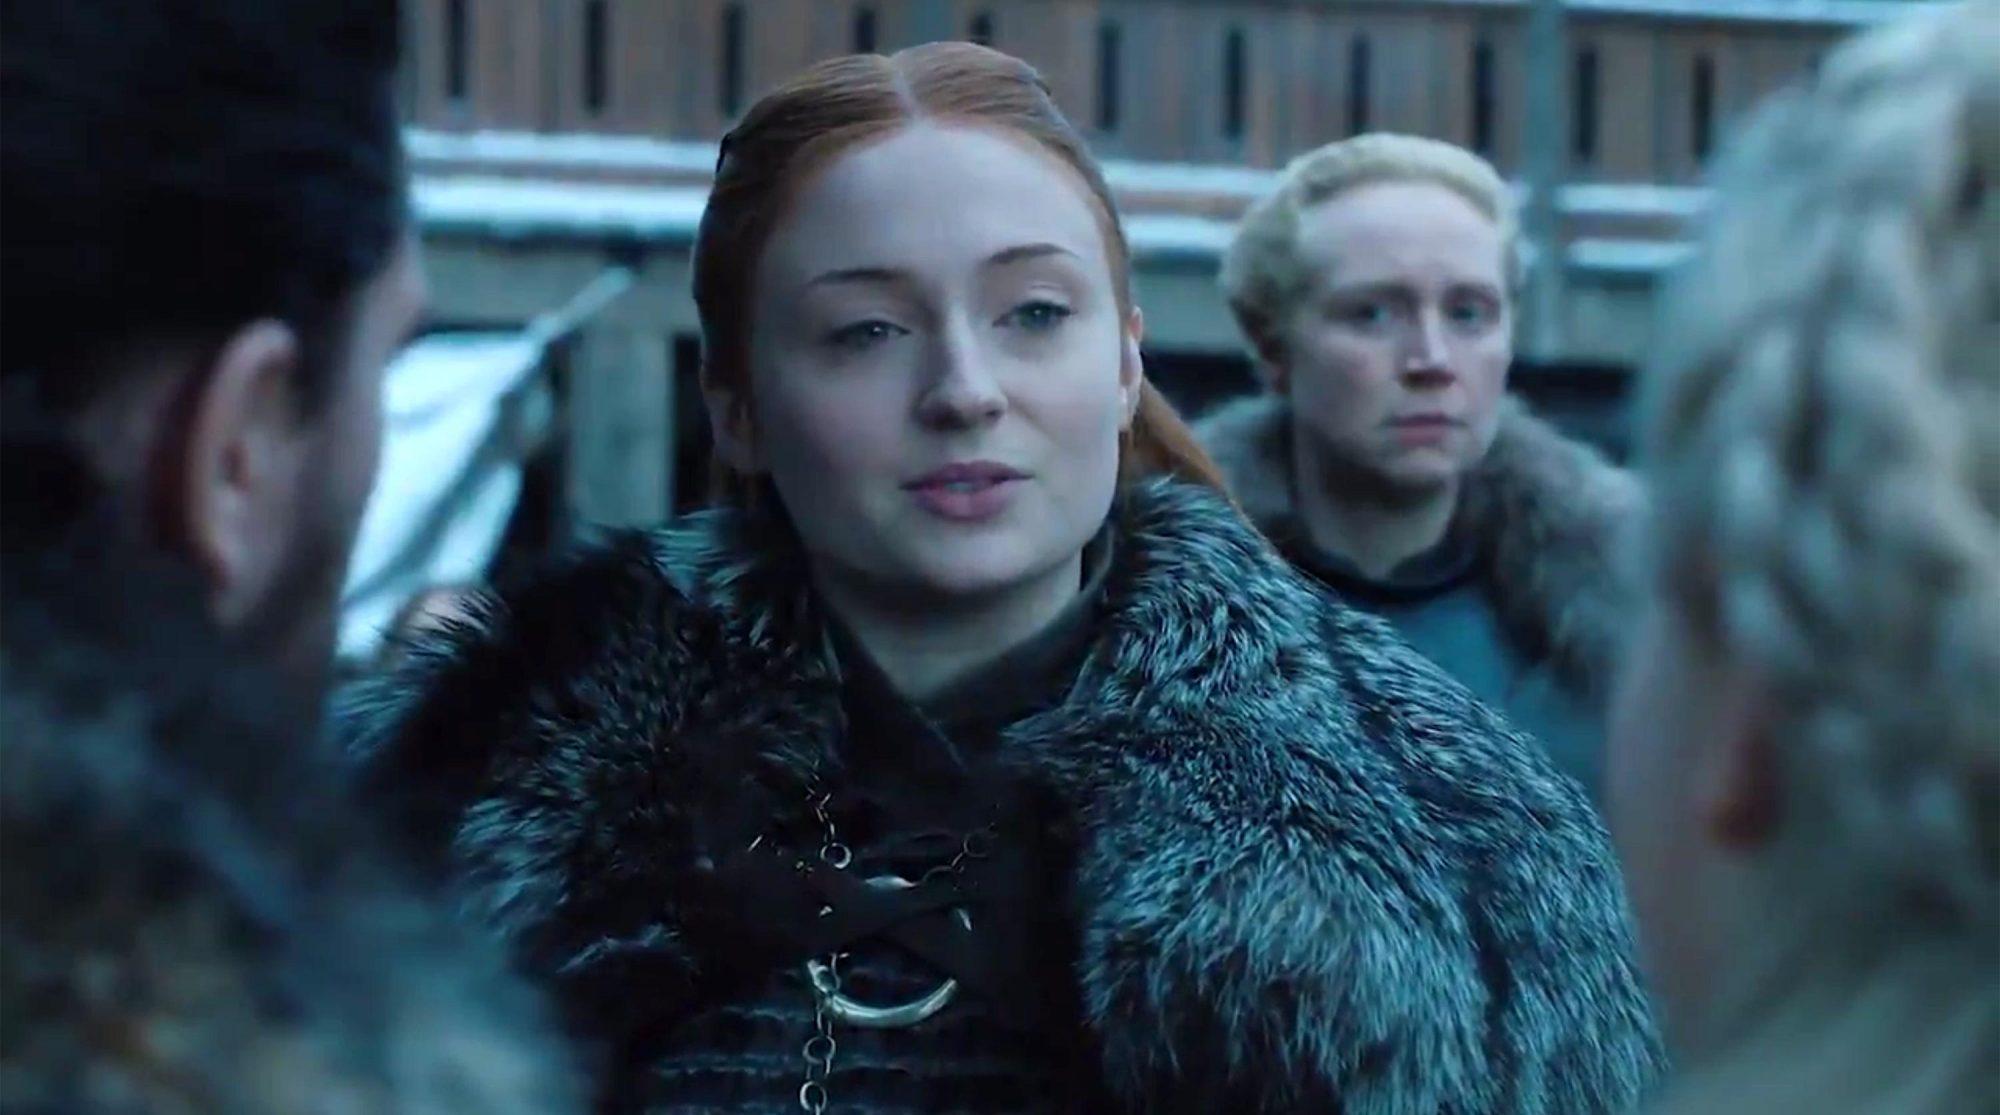 Game of Thrones screen grab